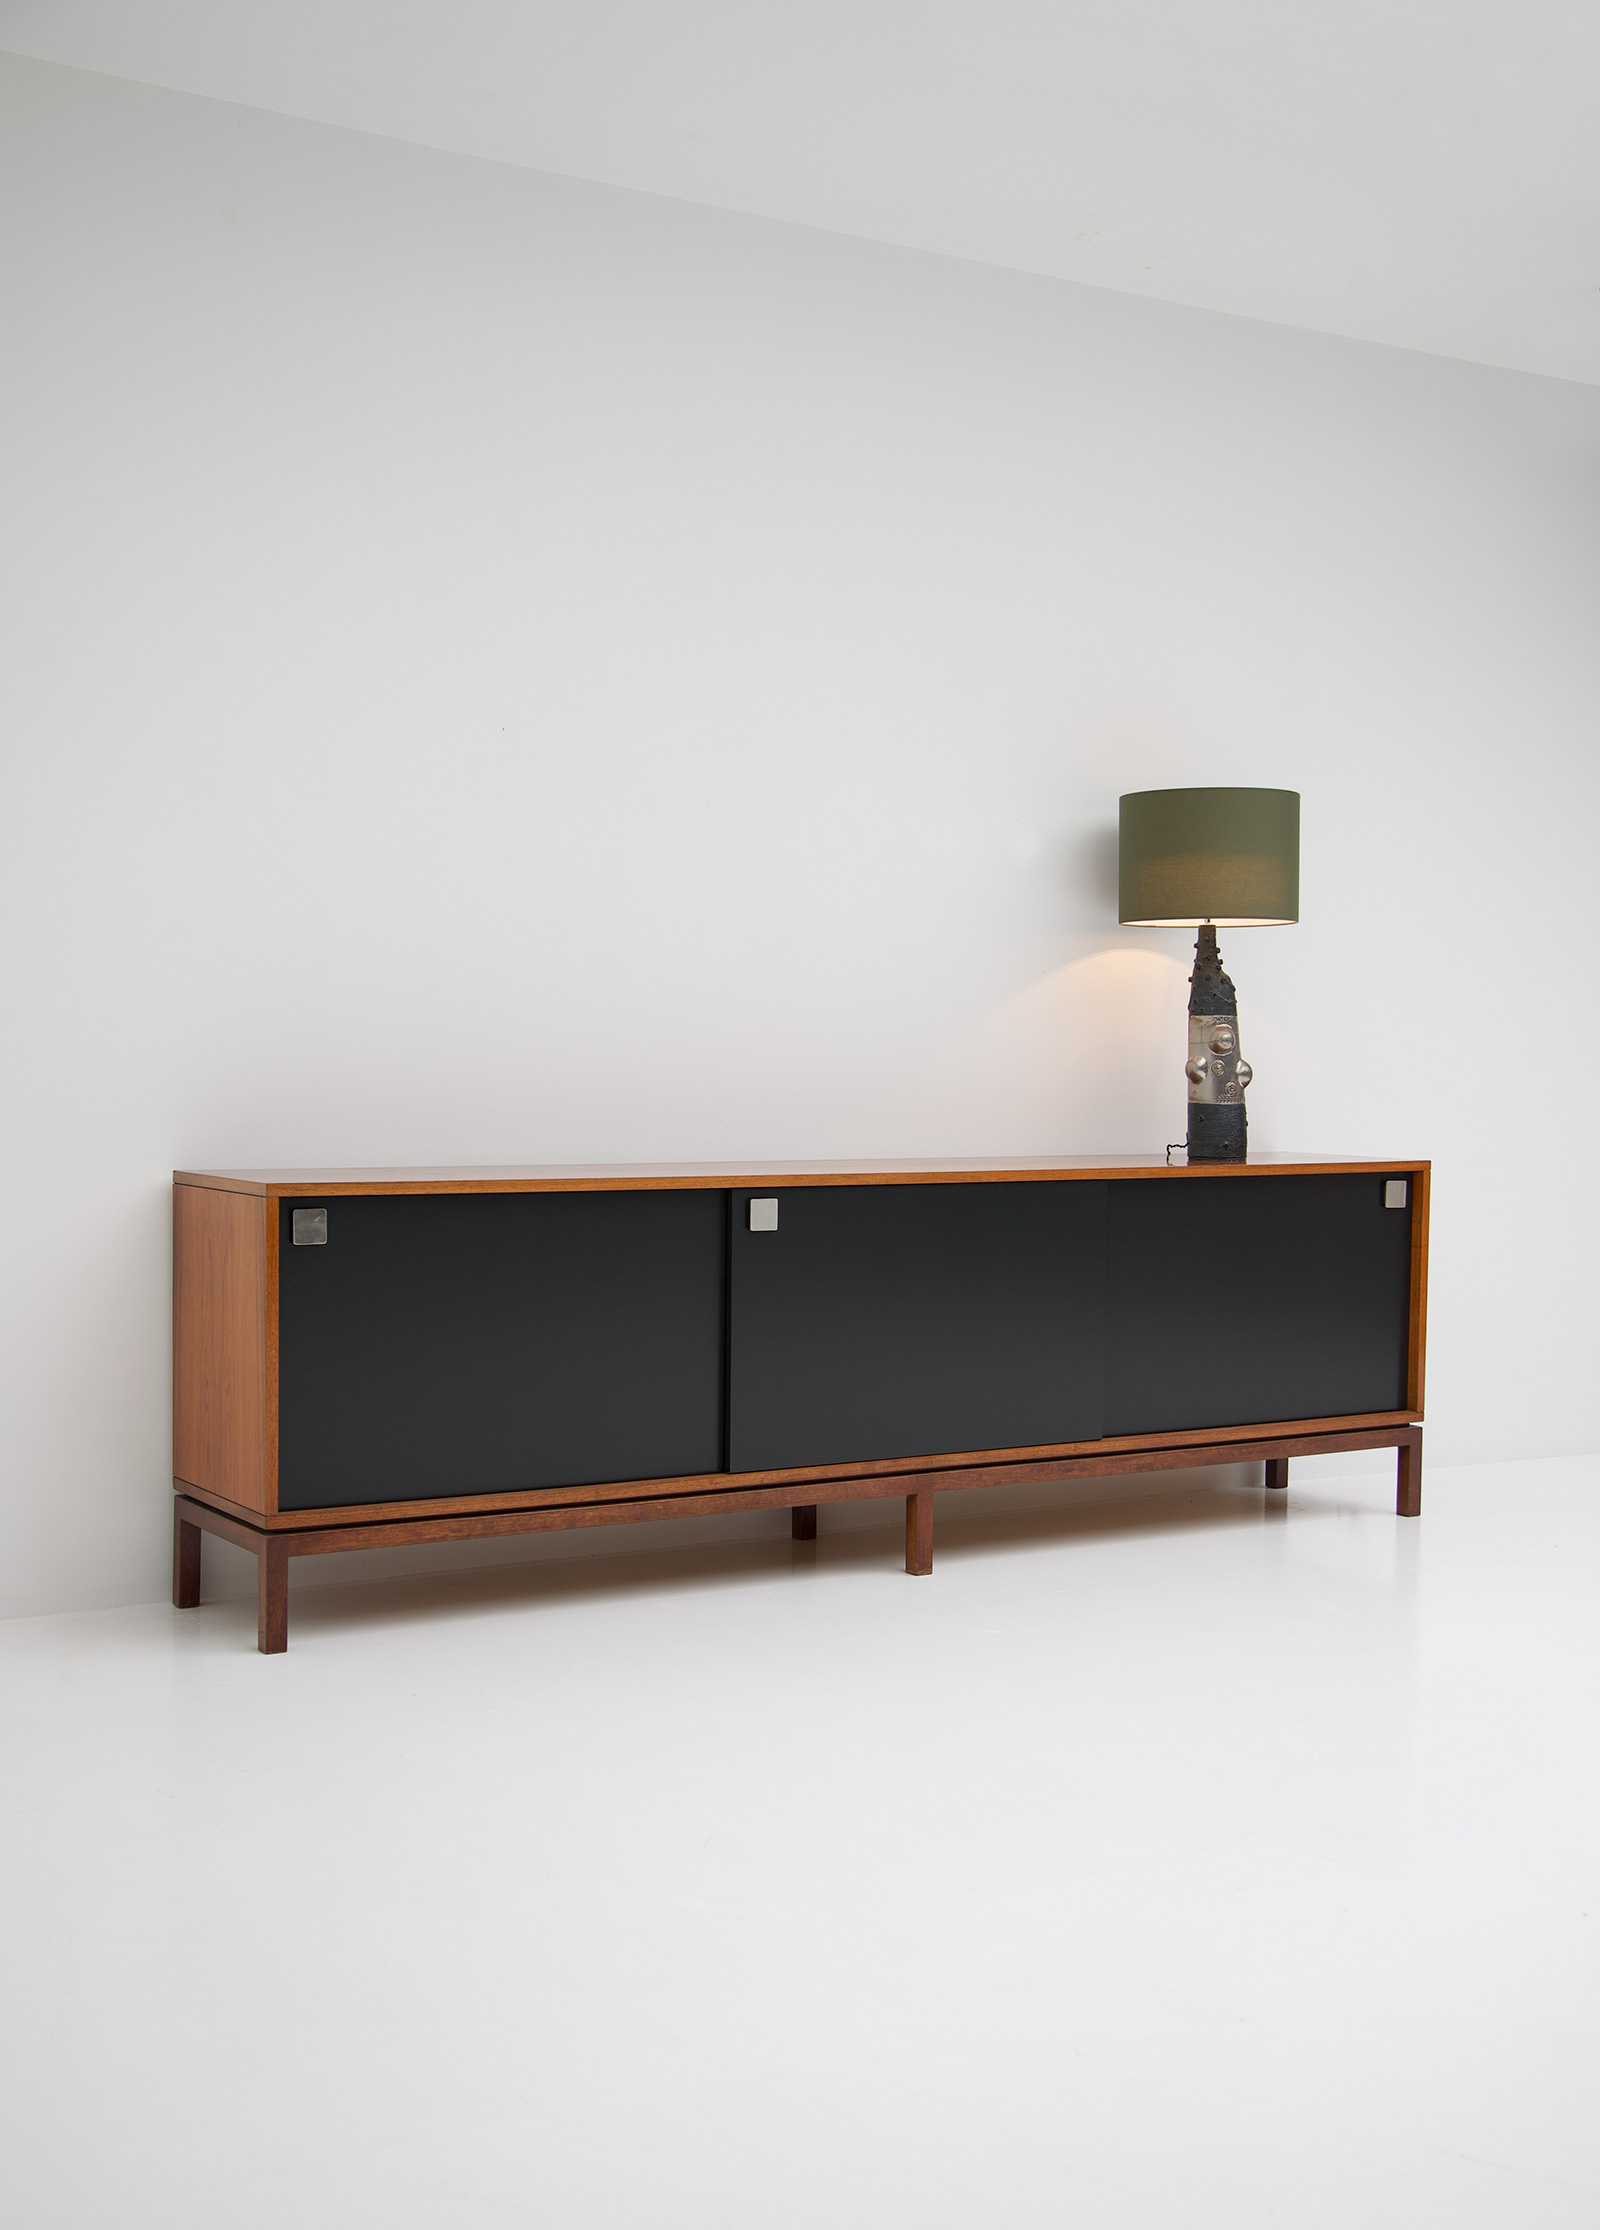 Alfred Hendrickx Large Belform Sideboardimage 10